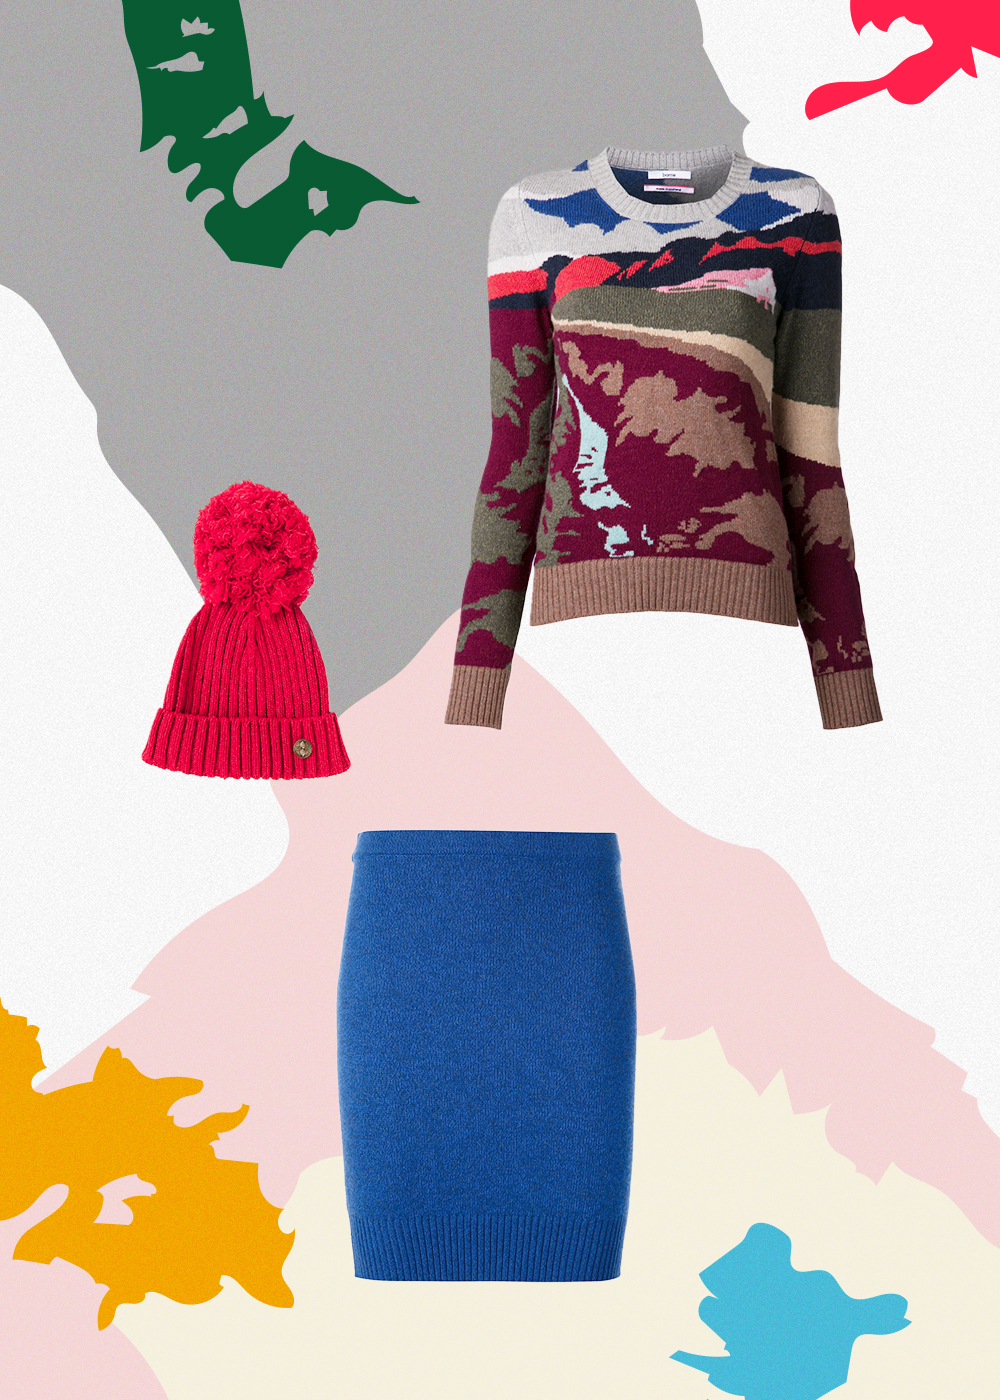 Maison-Mittweg-Fashion-Barrie-Knitwear-Designers-Chanel